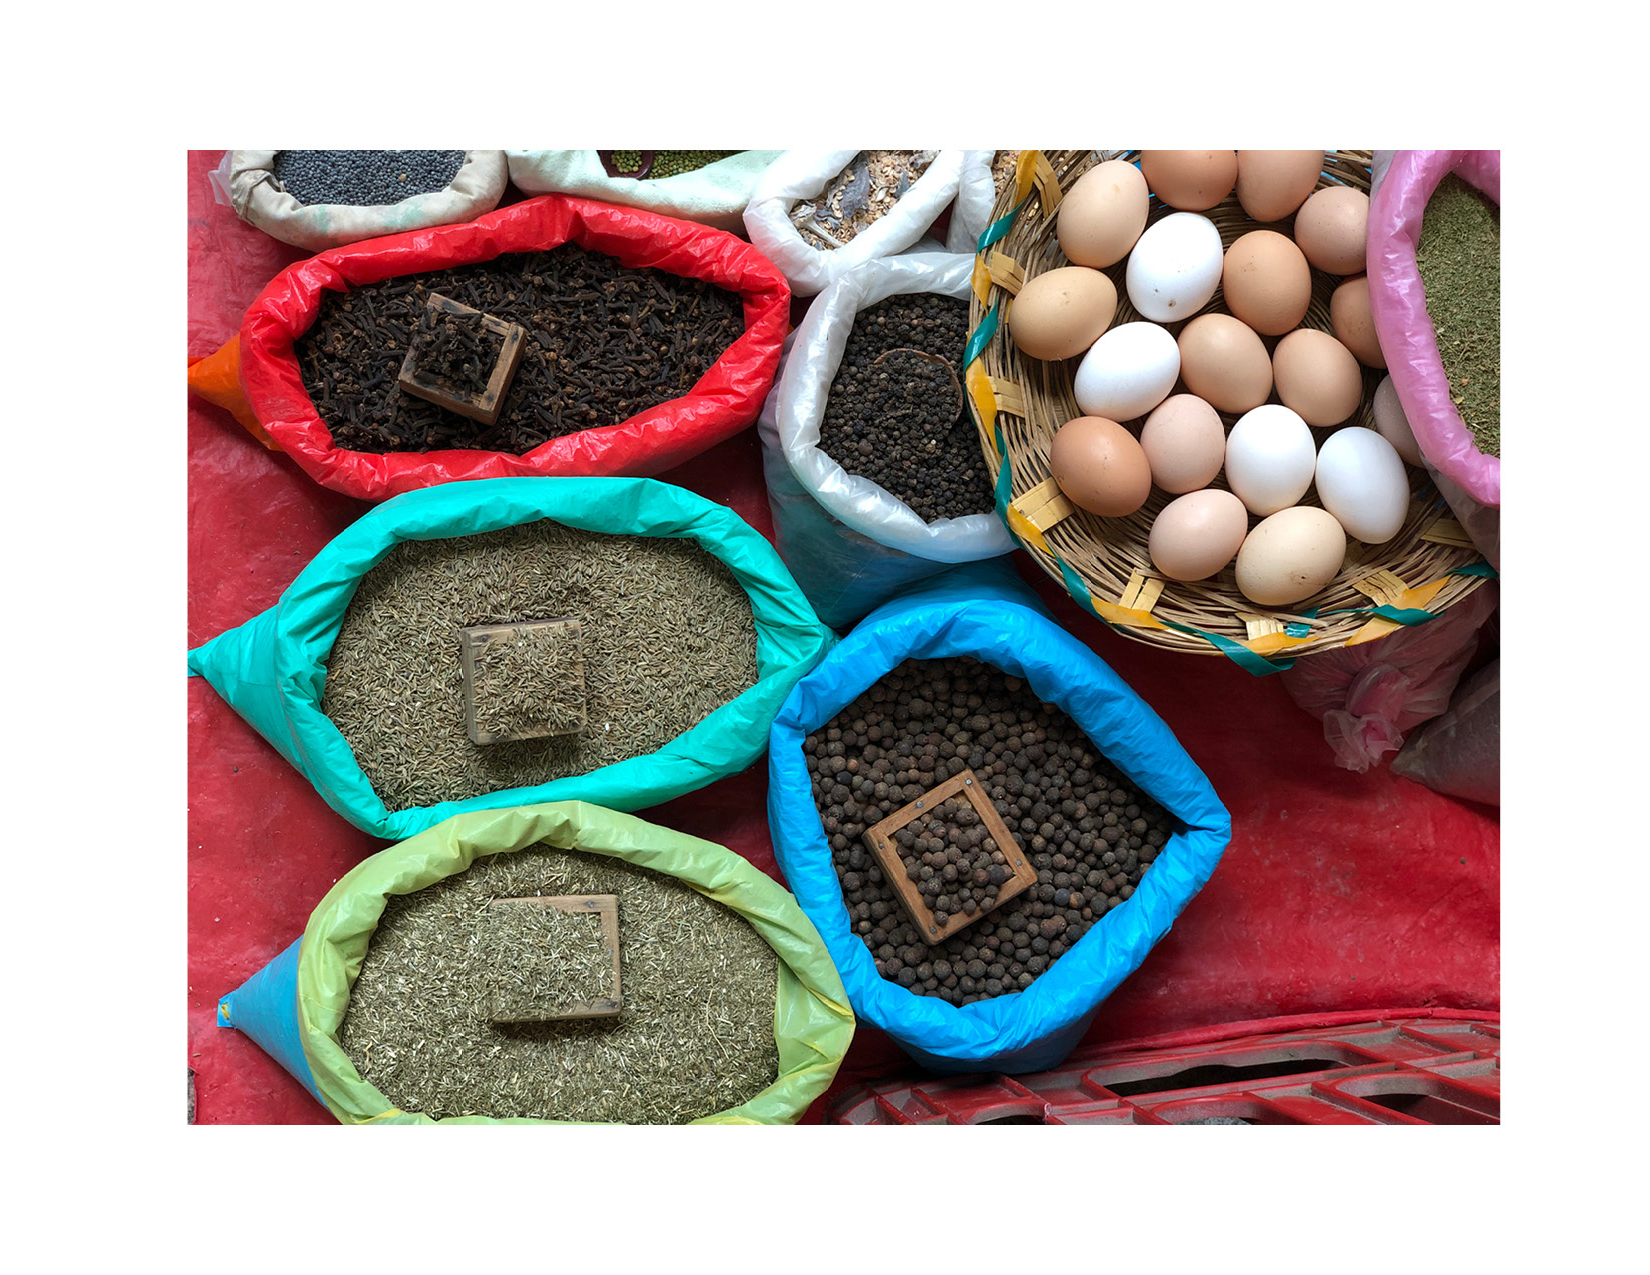 mercado-oaxaca-for-web5.jpg